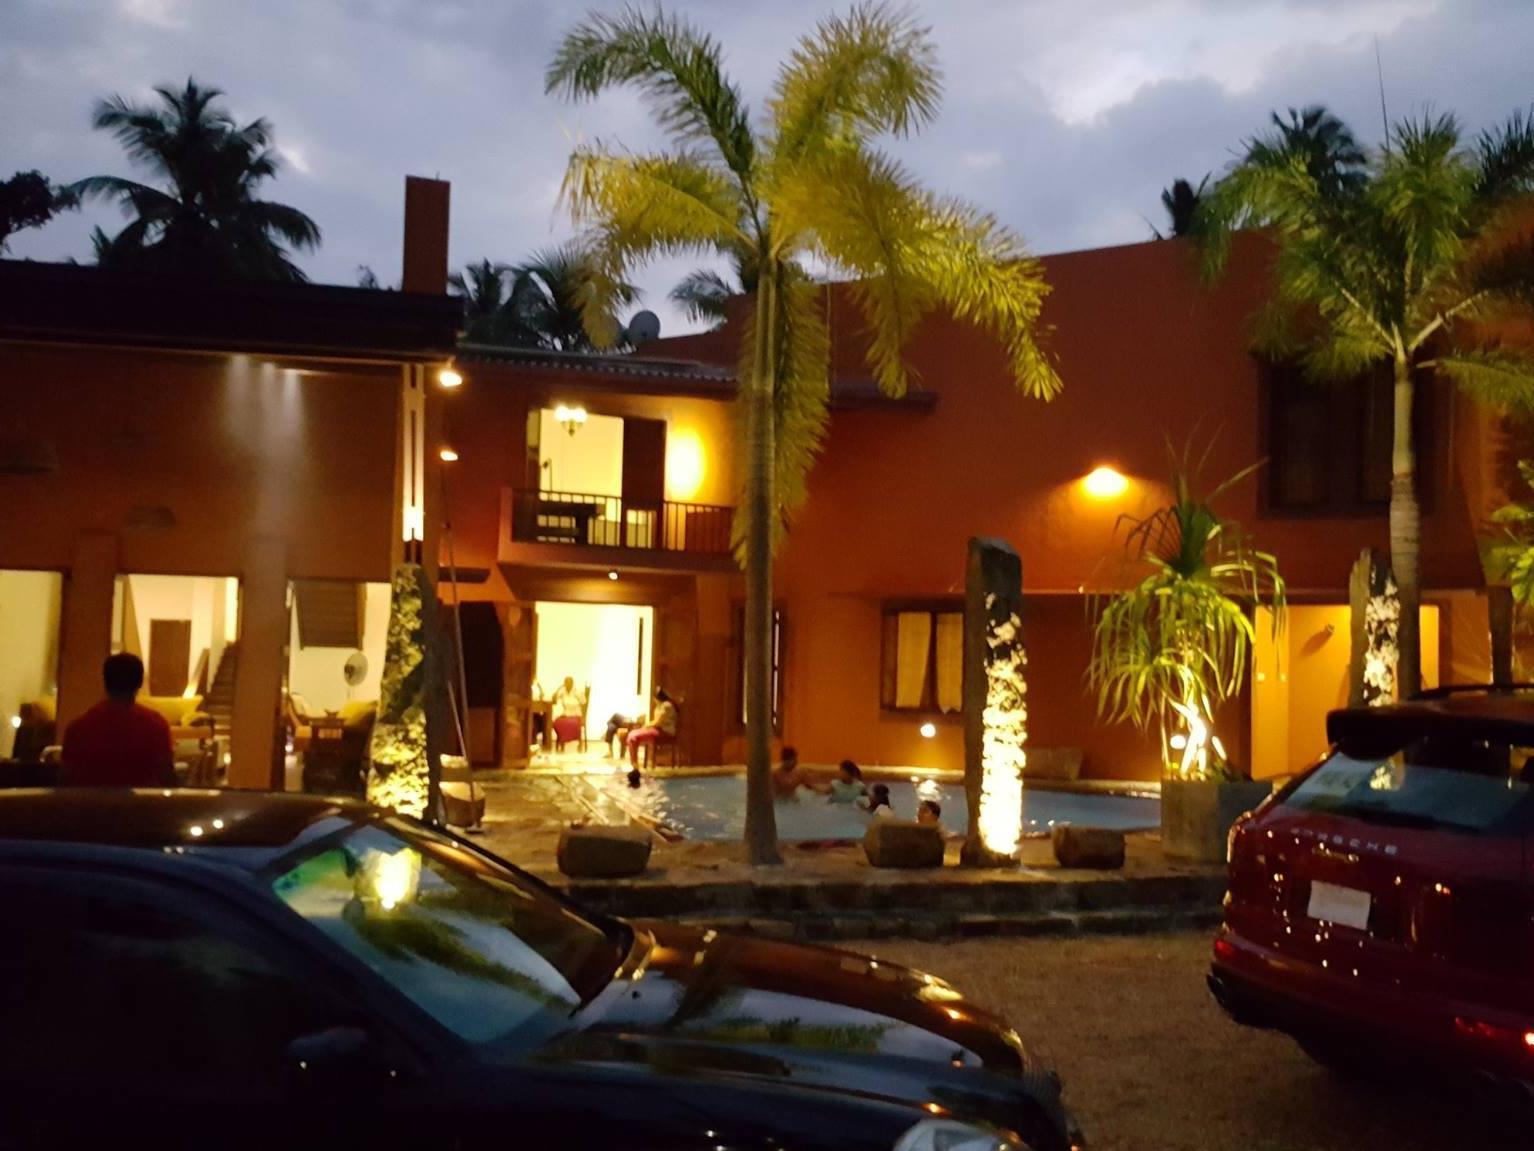 Lacasita bentota - Hotels and Accommodation in Sri Lanka, Asia